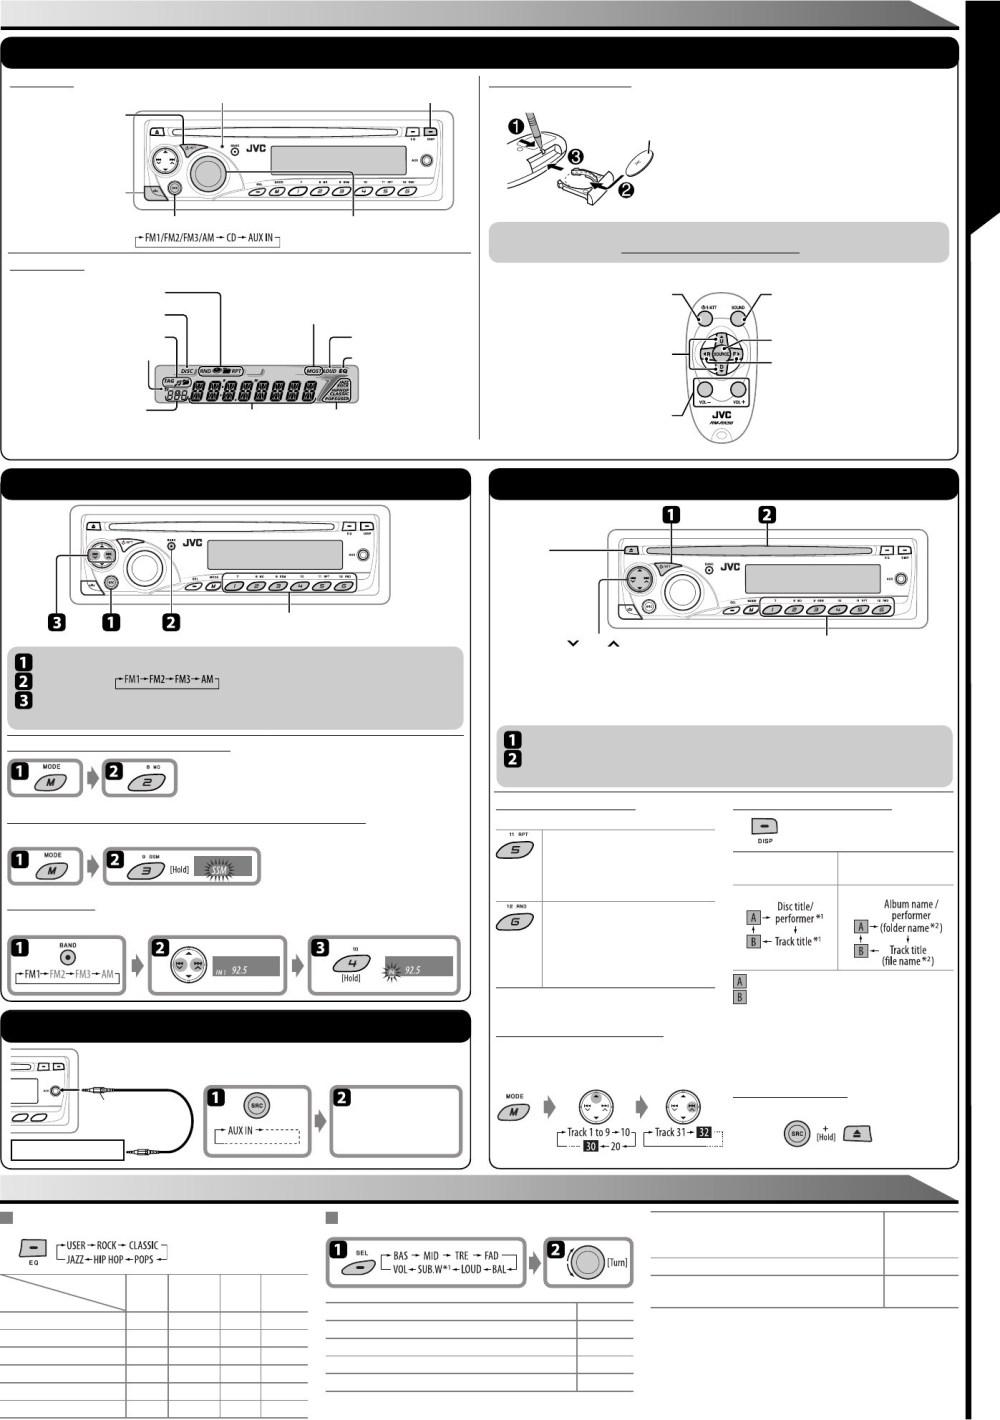 medium resolution of jvc kd s26 wiring harness wiring diagram basic jvc kd s26 wiring harness